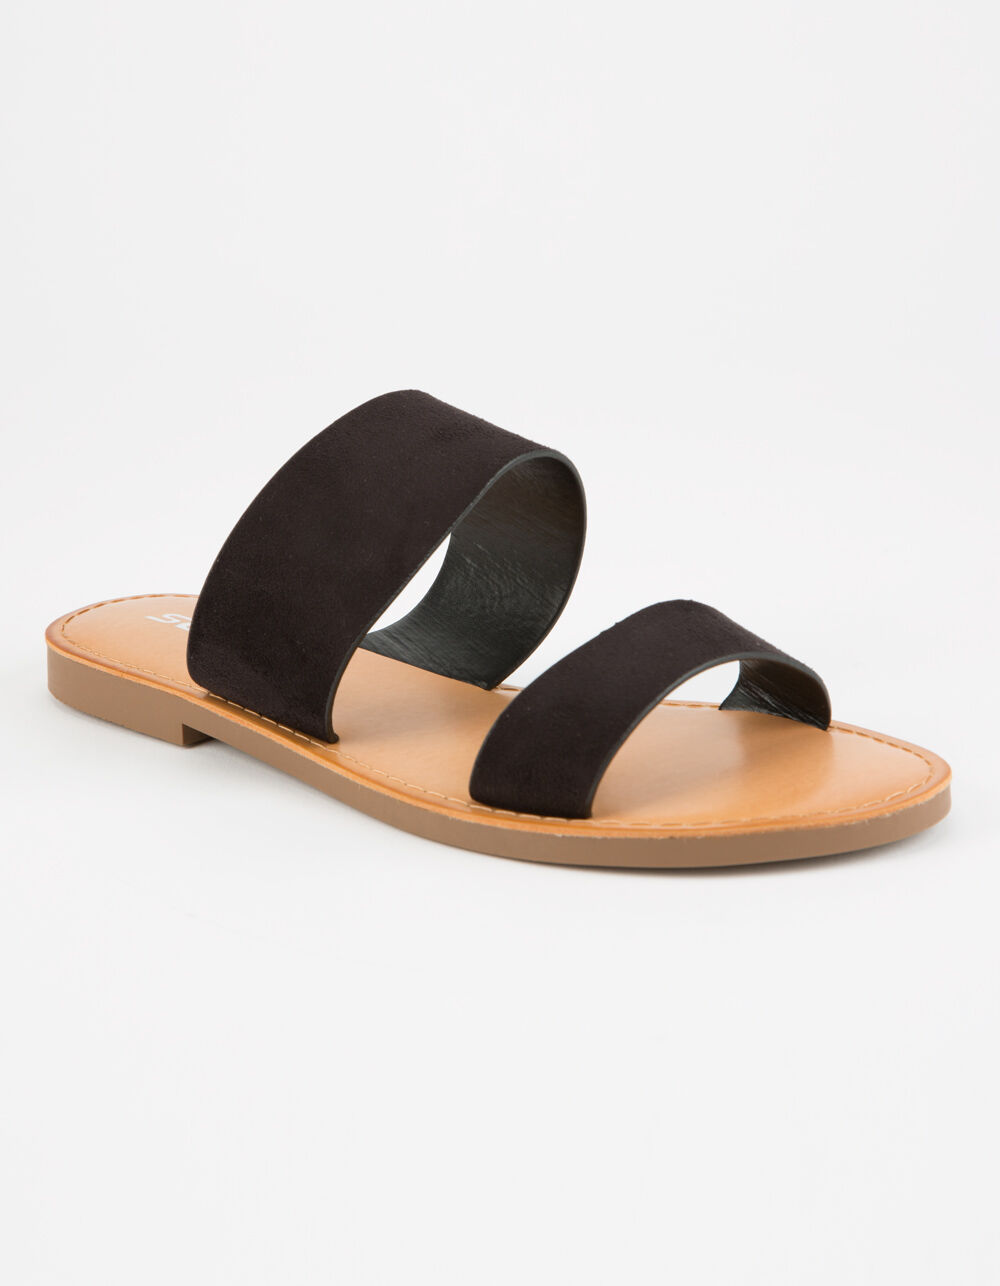 SODA Double Strap Black Sandals